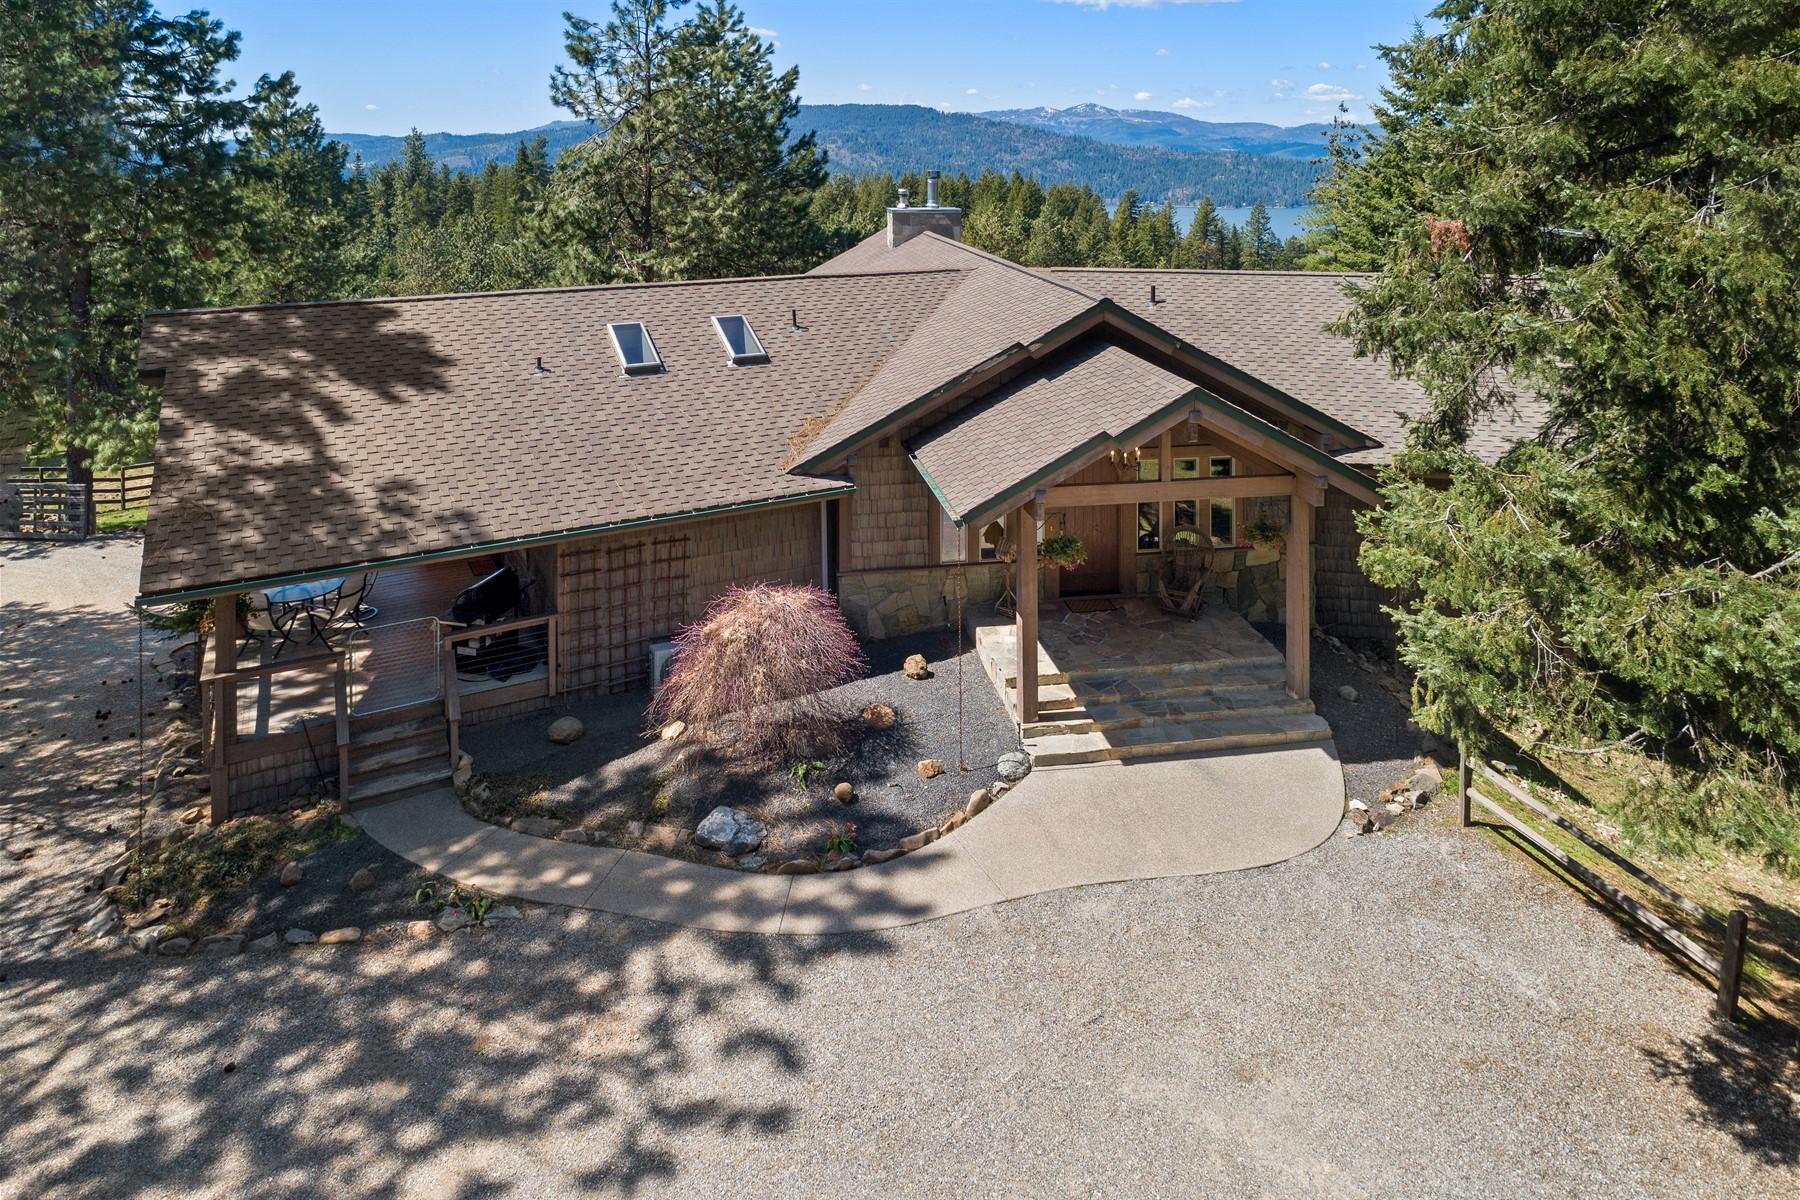 Single Family Home for Active at 2093 E Venture Trail 2093 E Venture Trl Harrison, Idaho 83833 United States